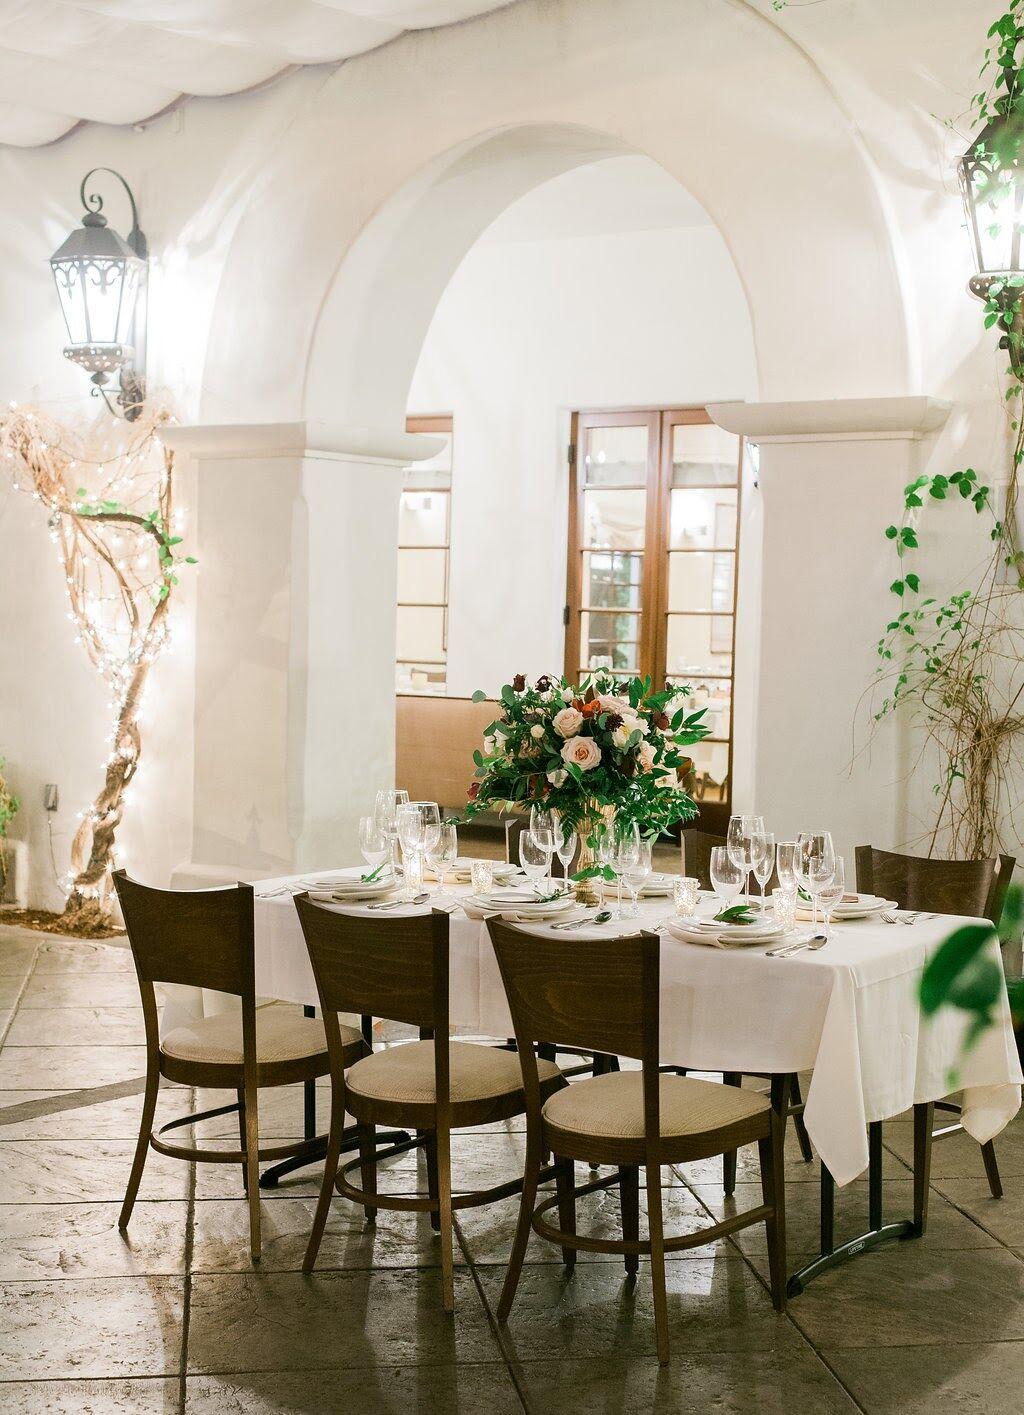 burlap-and-bordeux-steven-leyva-photography-villa-and-vine-wedding-styled-shoot-41_preview.jpg